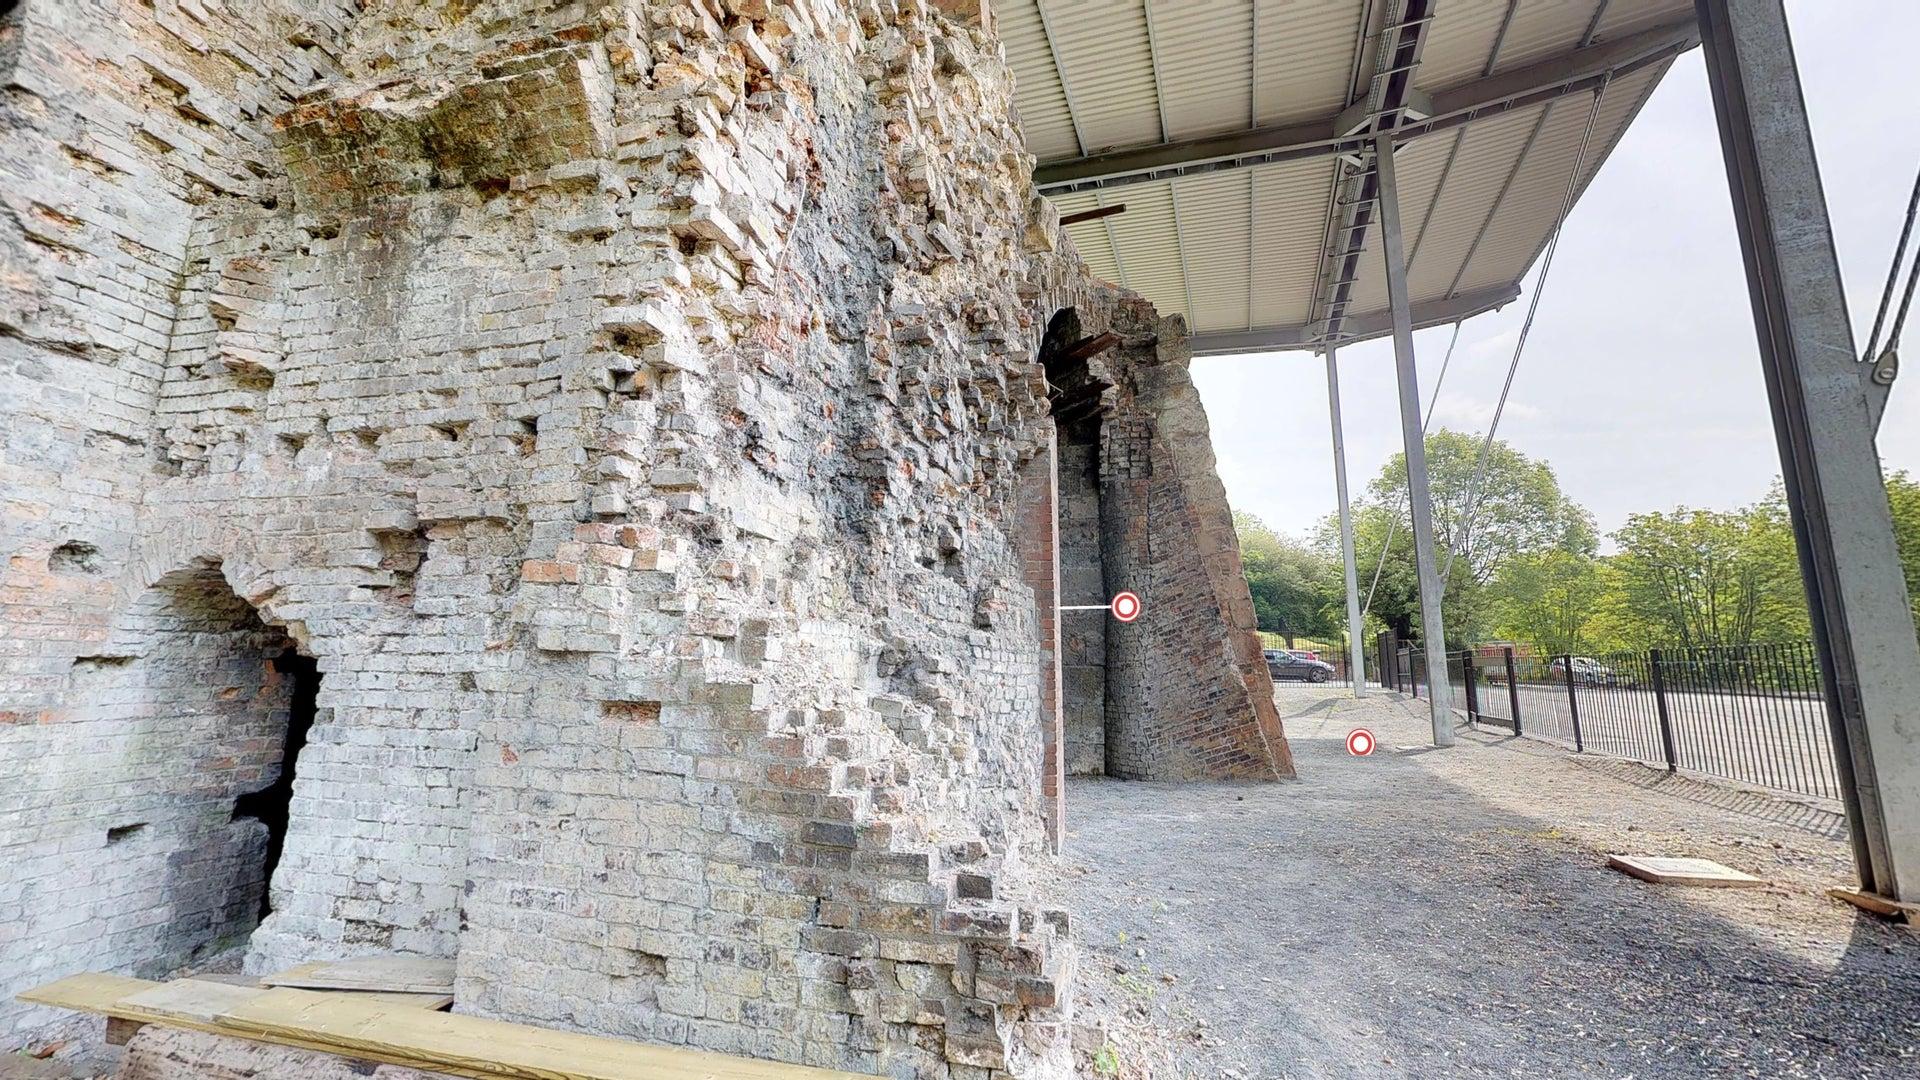 Bedlam Furnaces, Ironbridge